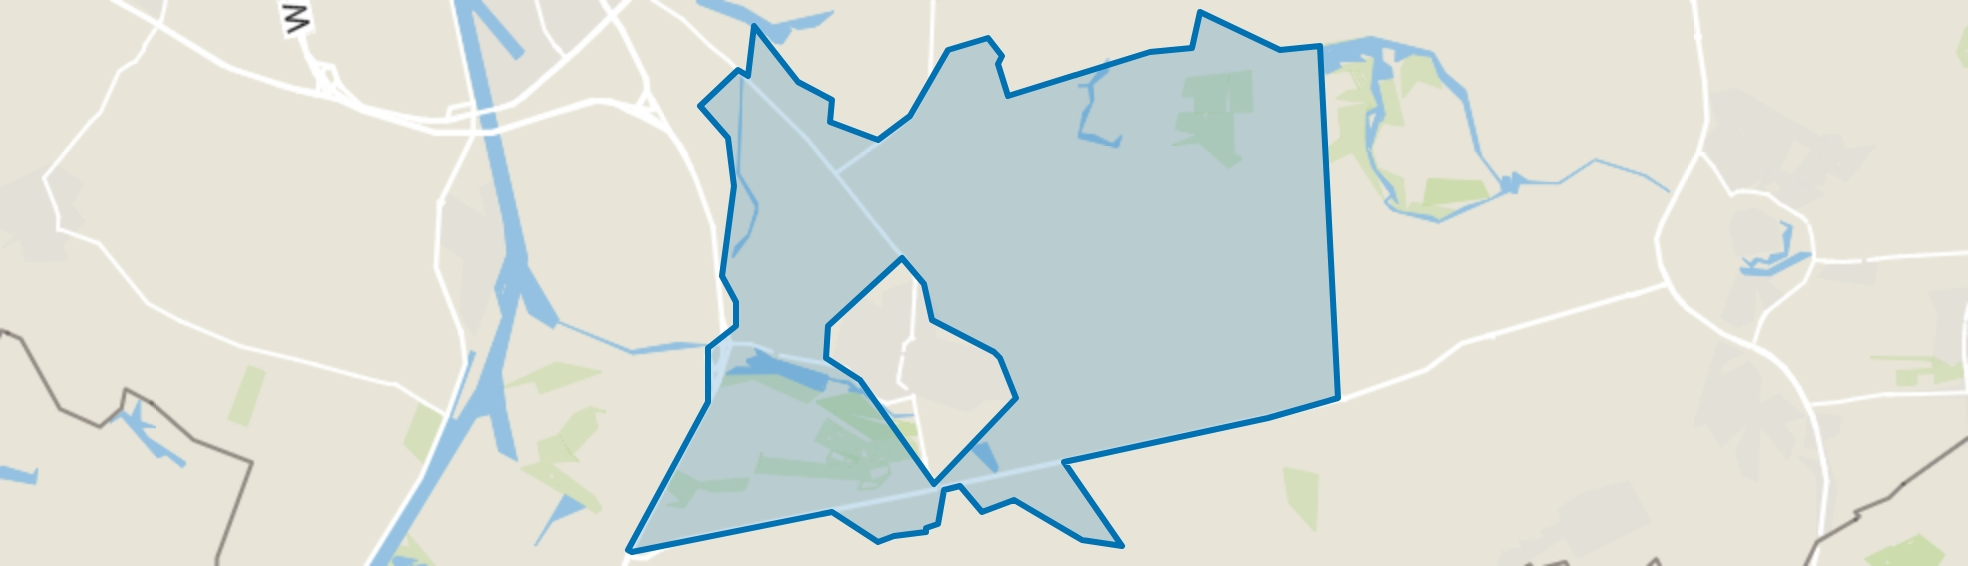 Buitengebied Axel, Axel map